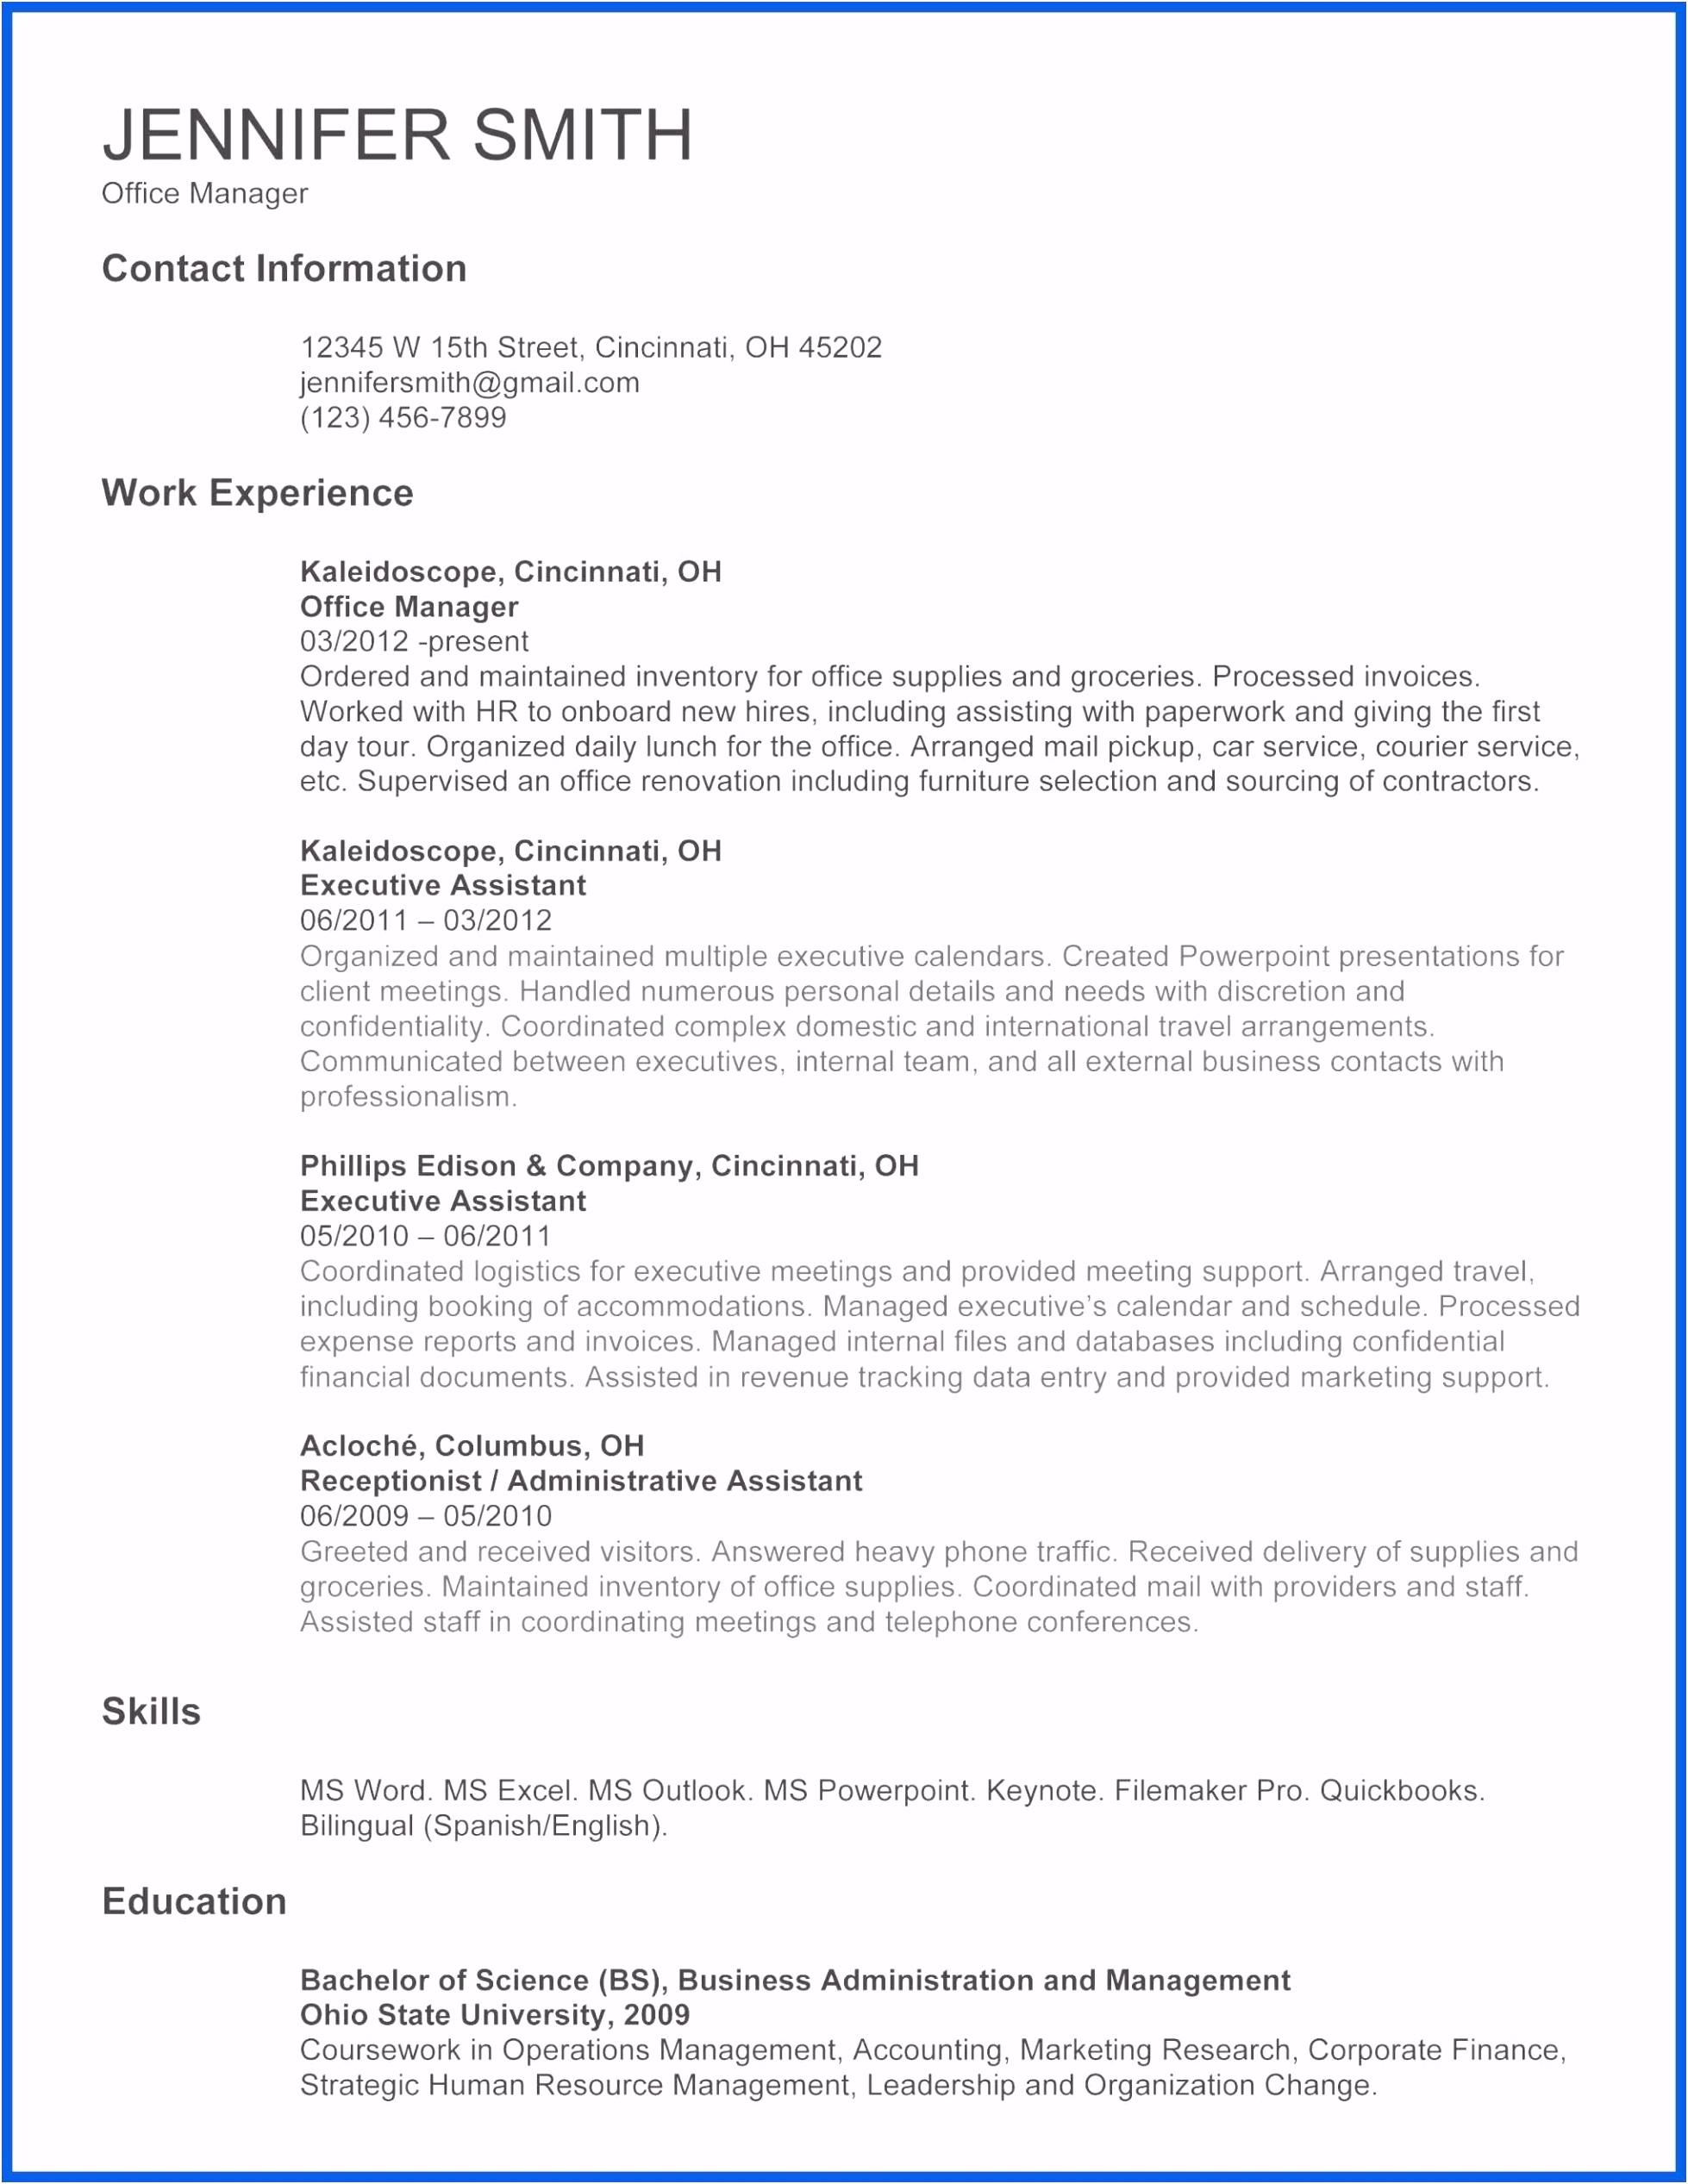 Powerpoint 2010 Vorlagen Microsoft Fice Resume Templates 2010 S2yl37zaj4 Ghupv6teeu